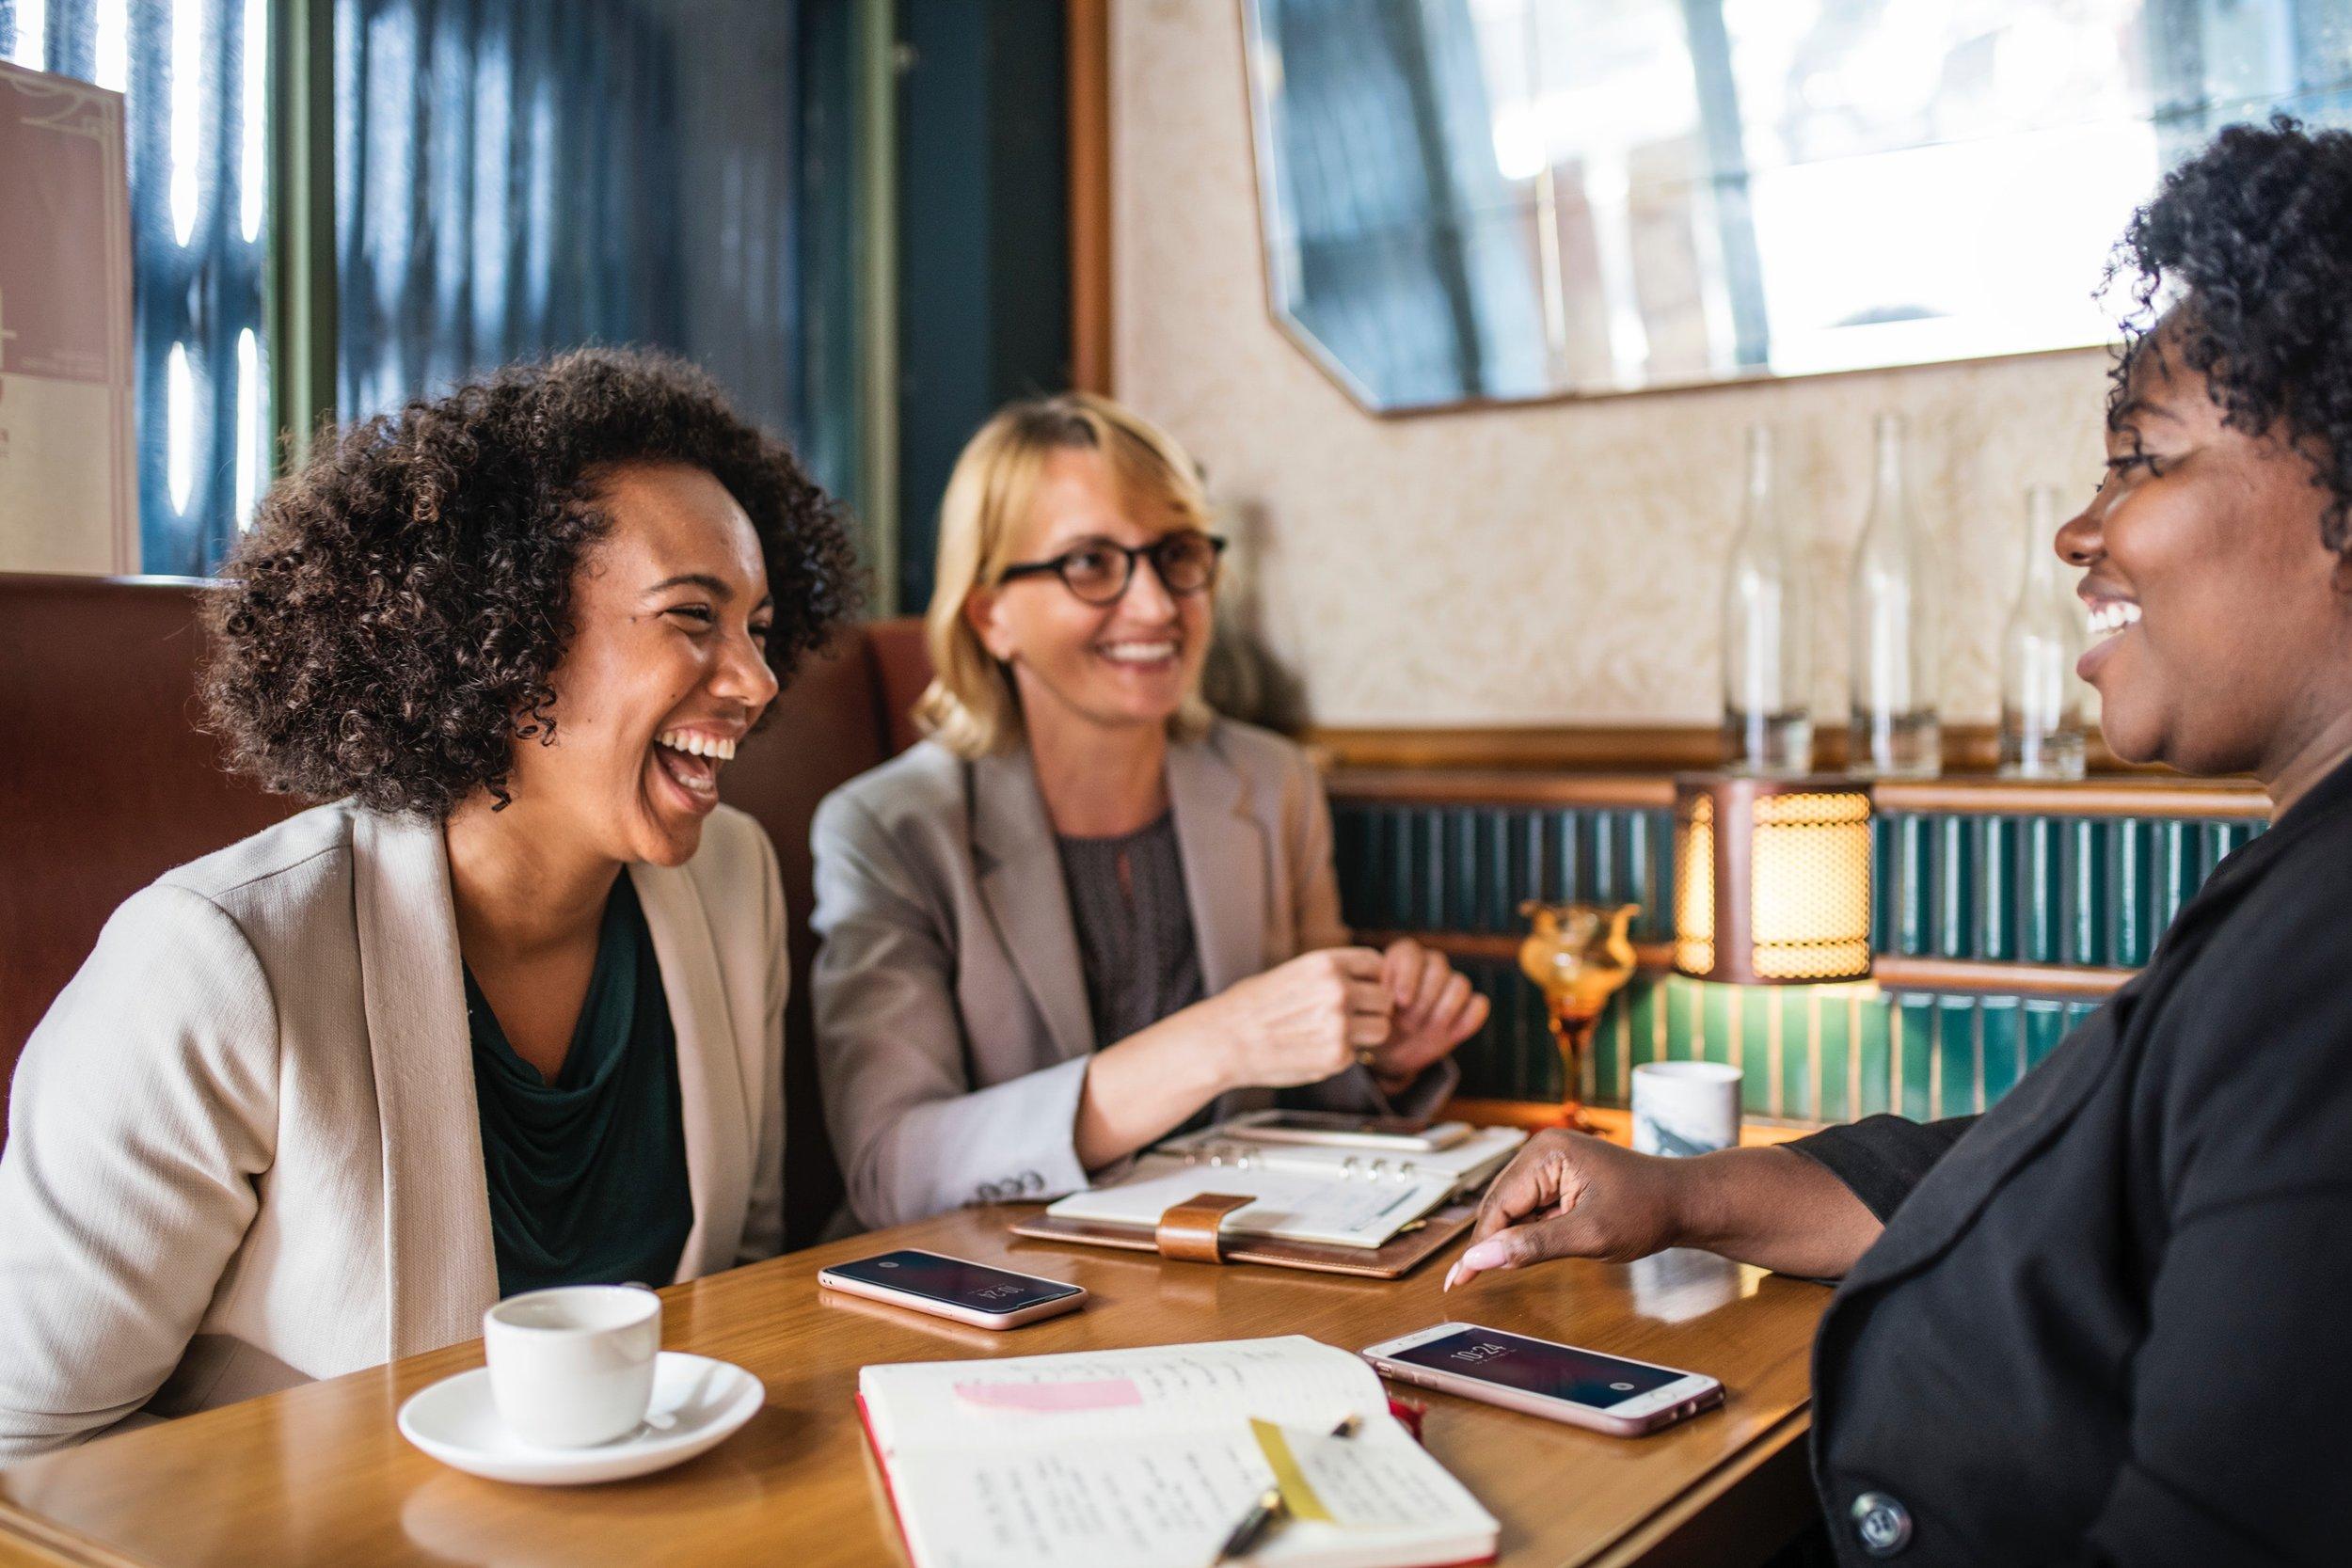 Catholic Women In Business - Co-Founder & President